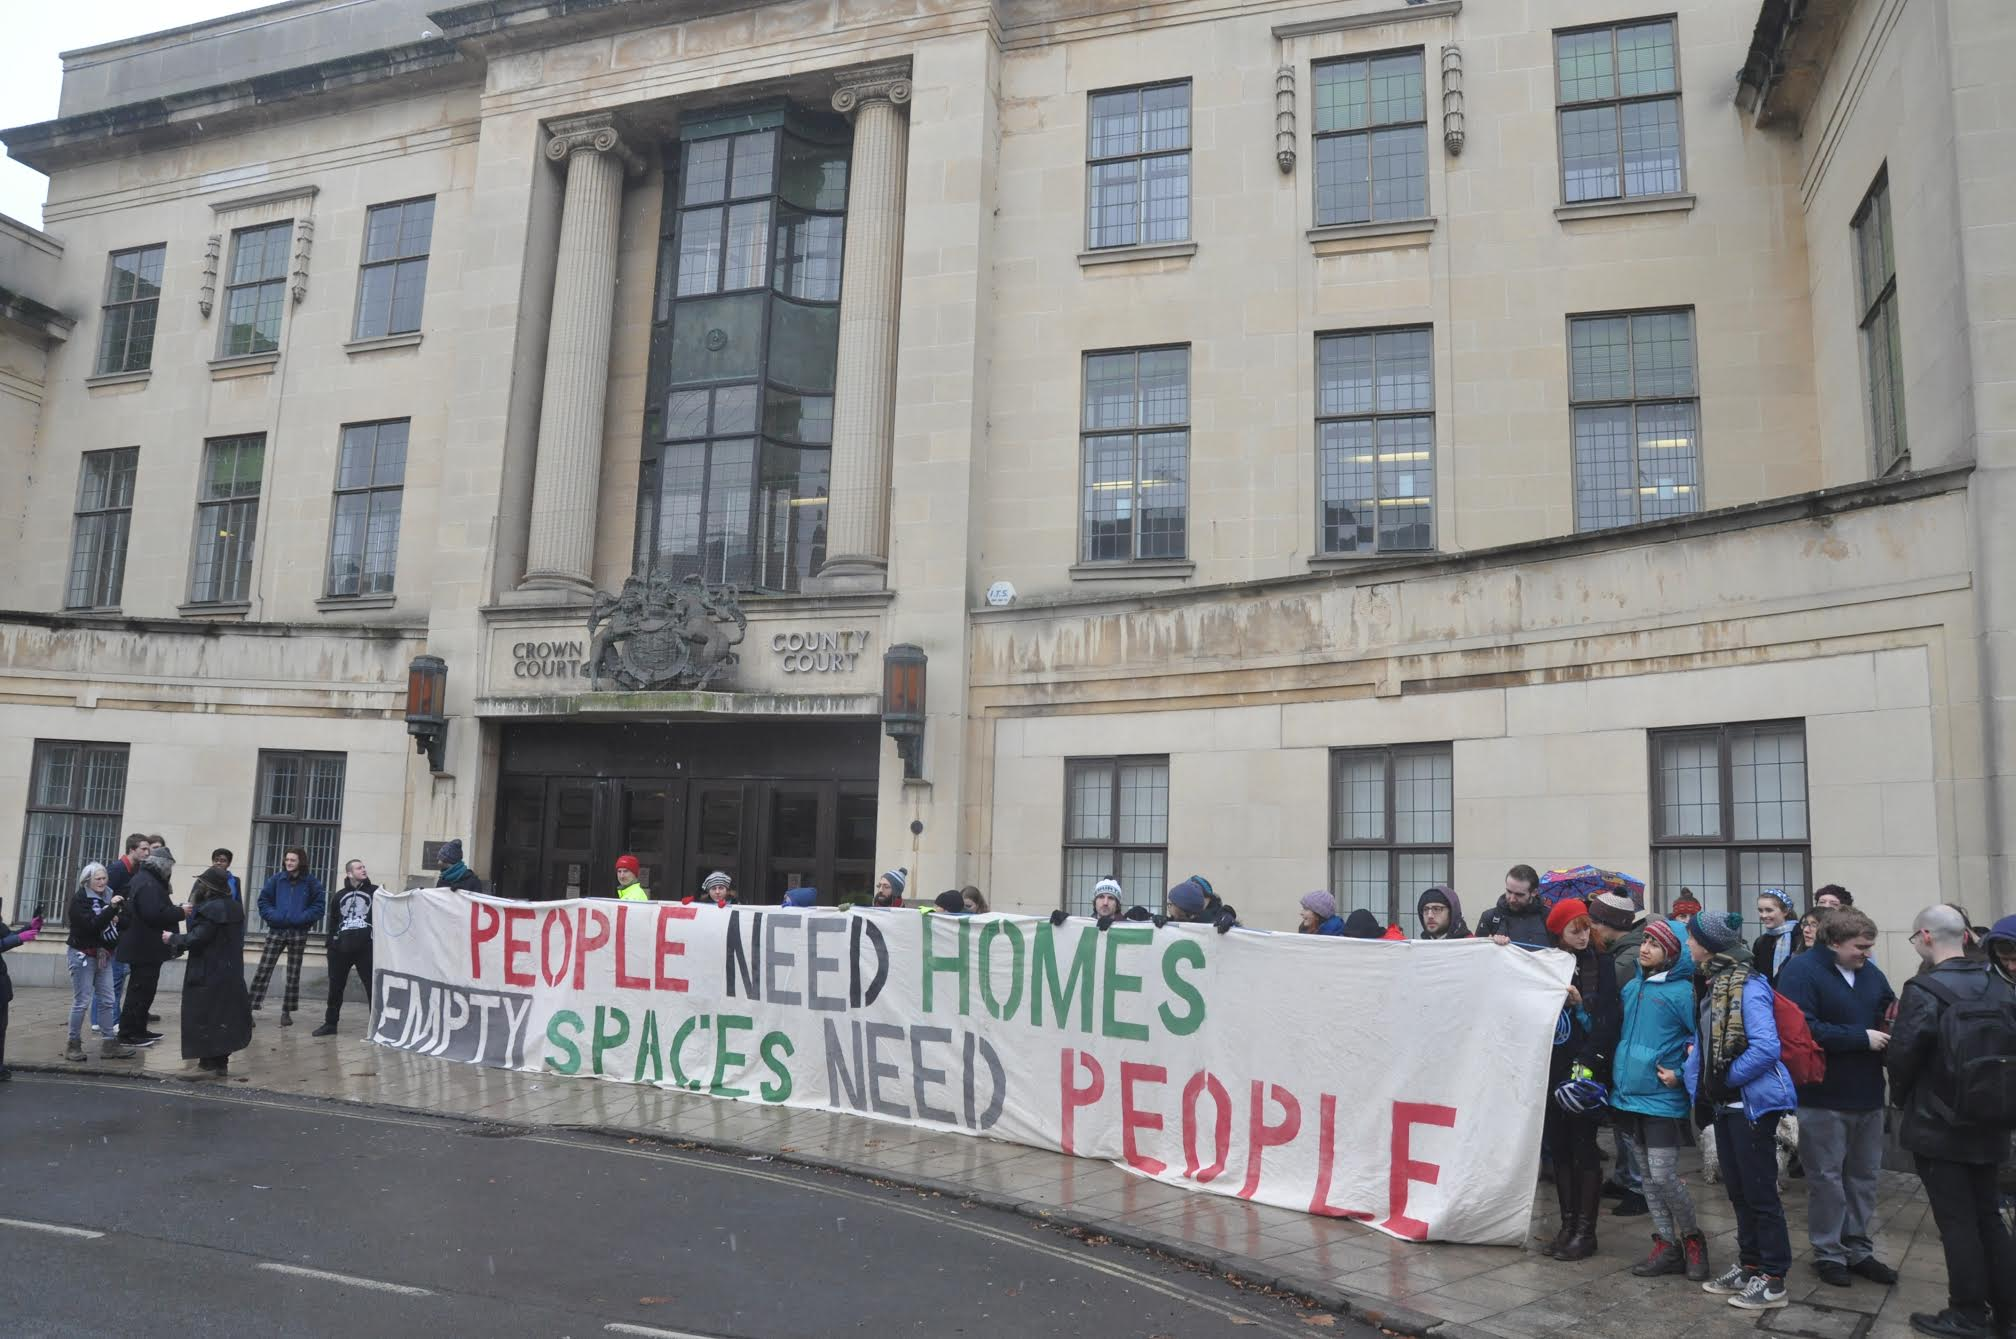 Iffley Open House Still At Risk Despite Court Ruling